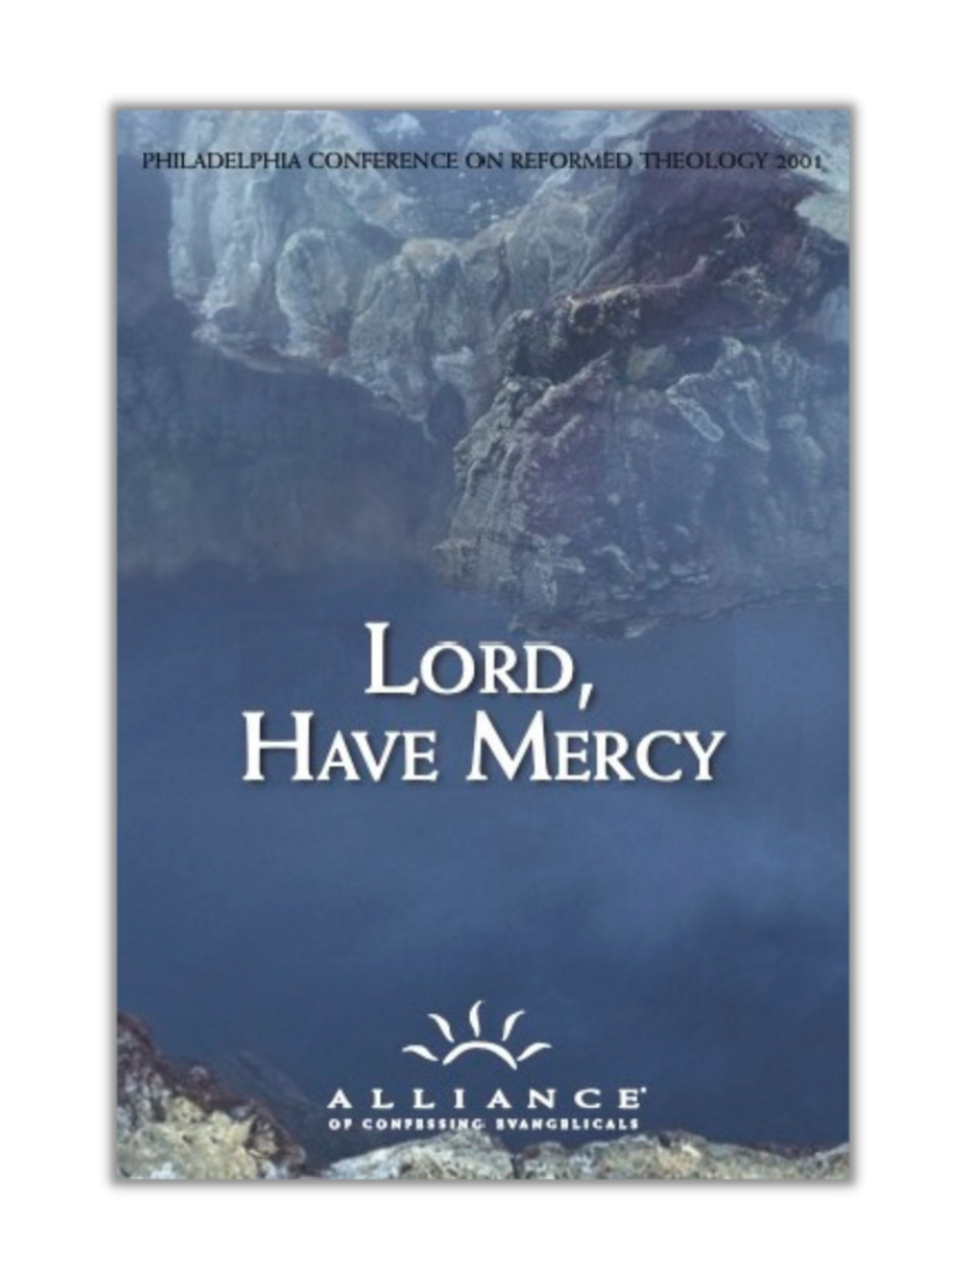 Lord, Have Mercy PCRT 2001 Seminars (mp3 Download Set)